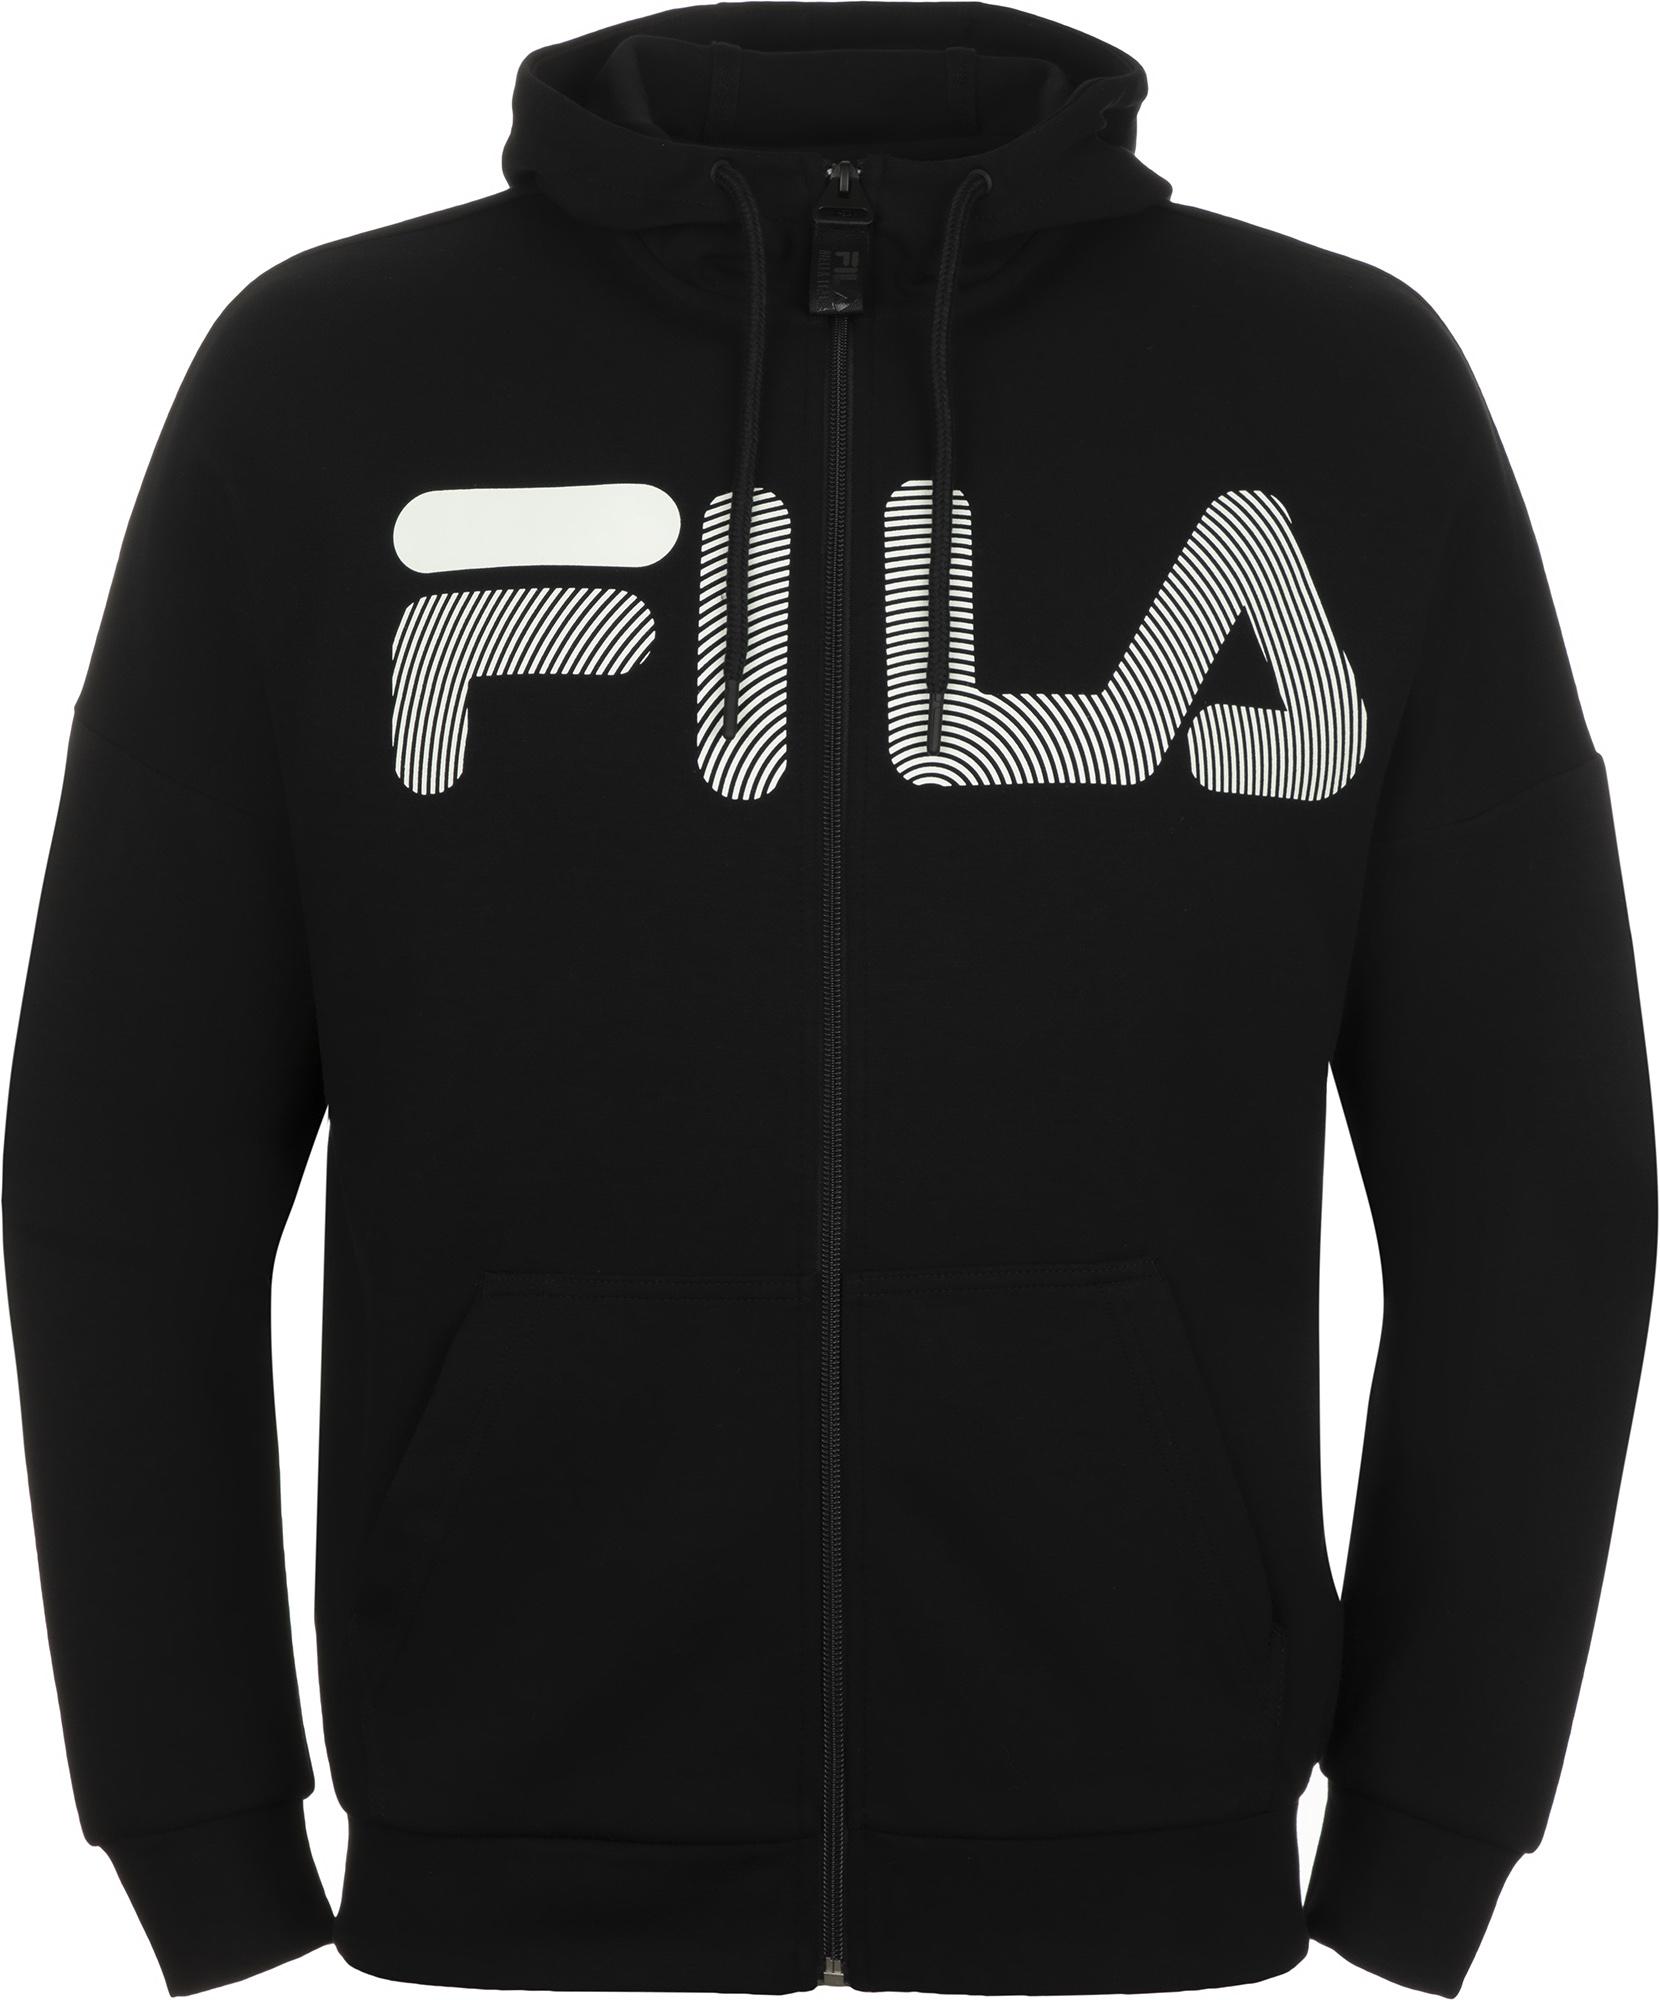 FILA Толстовка мужская FILA, размер 48-50 мужская толстовка и свитшот ричмонд